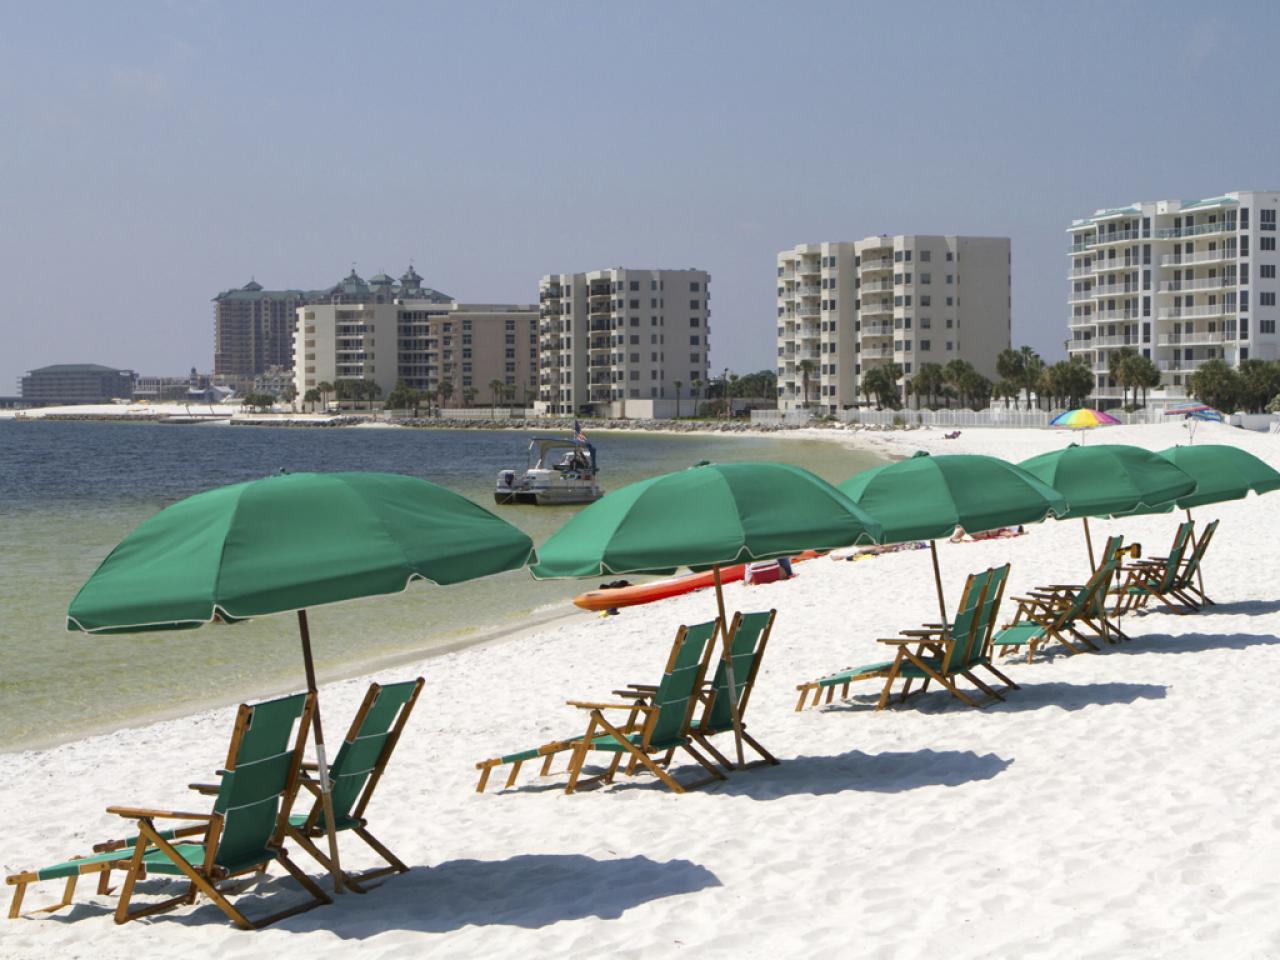 Louisiana Beach Condo Rentals